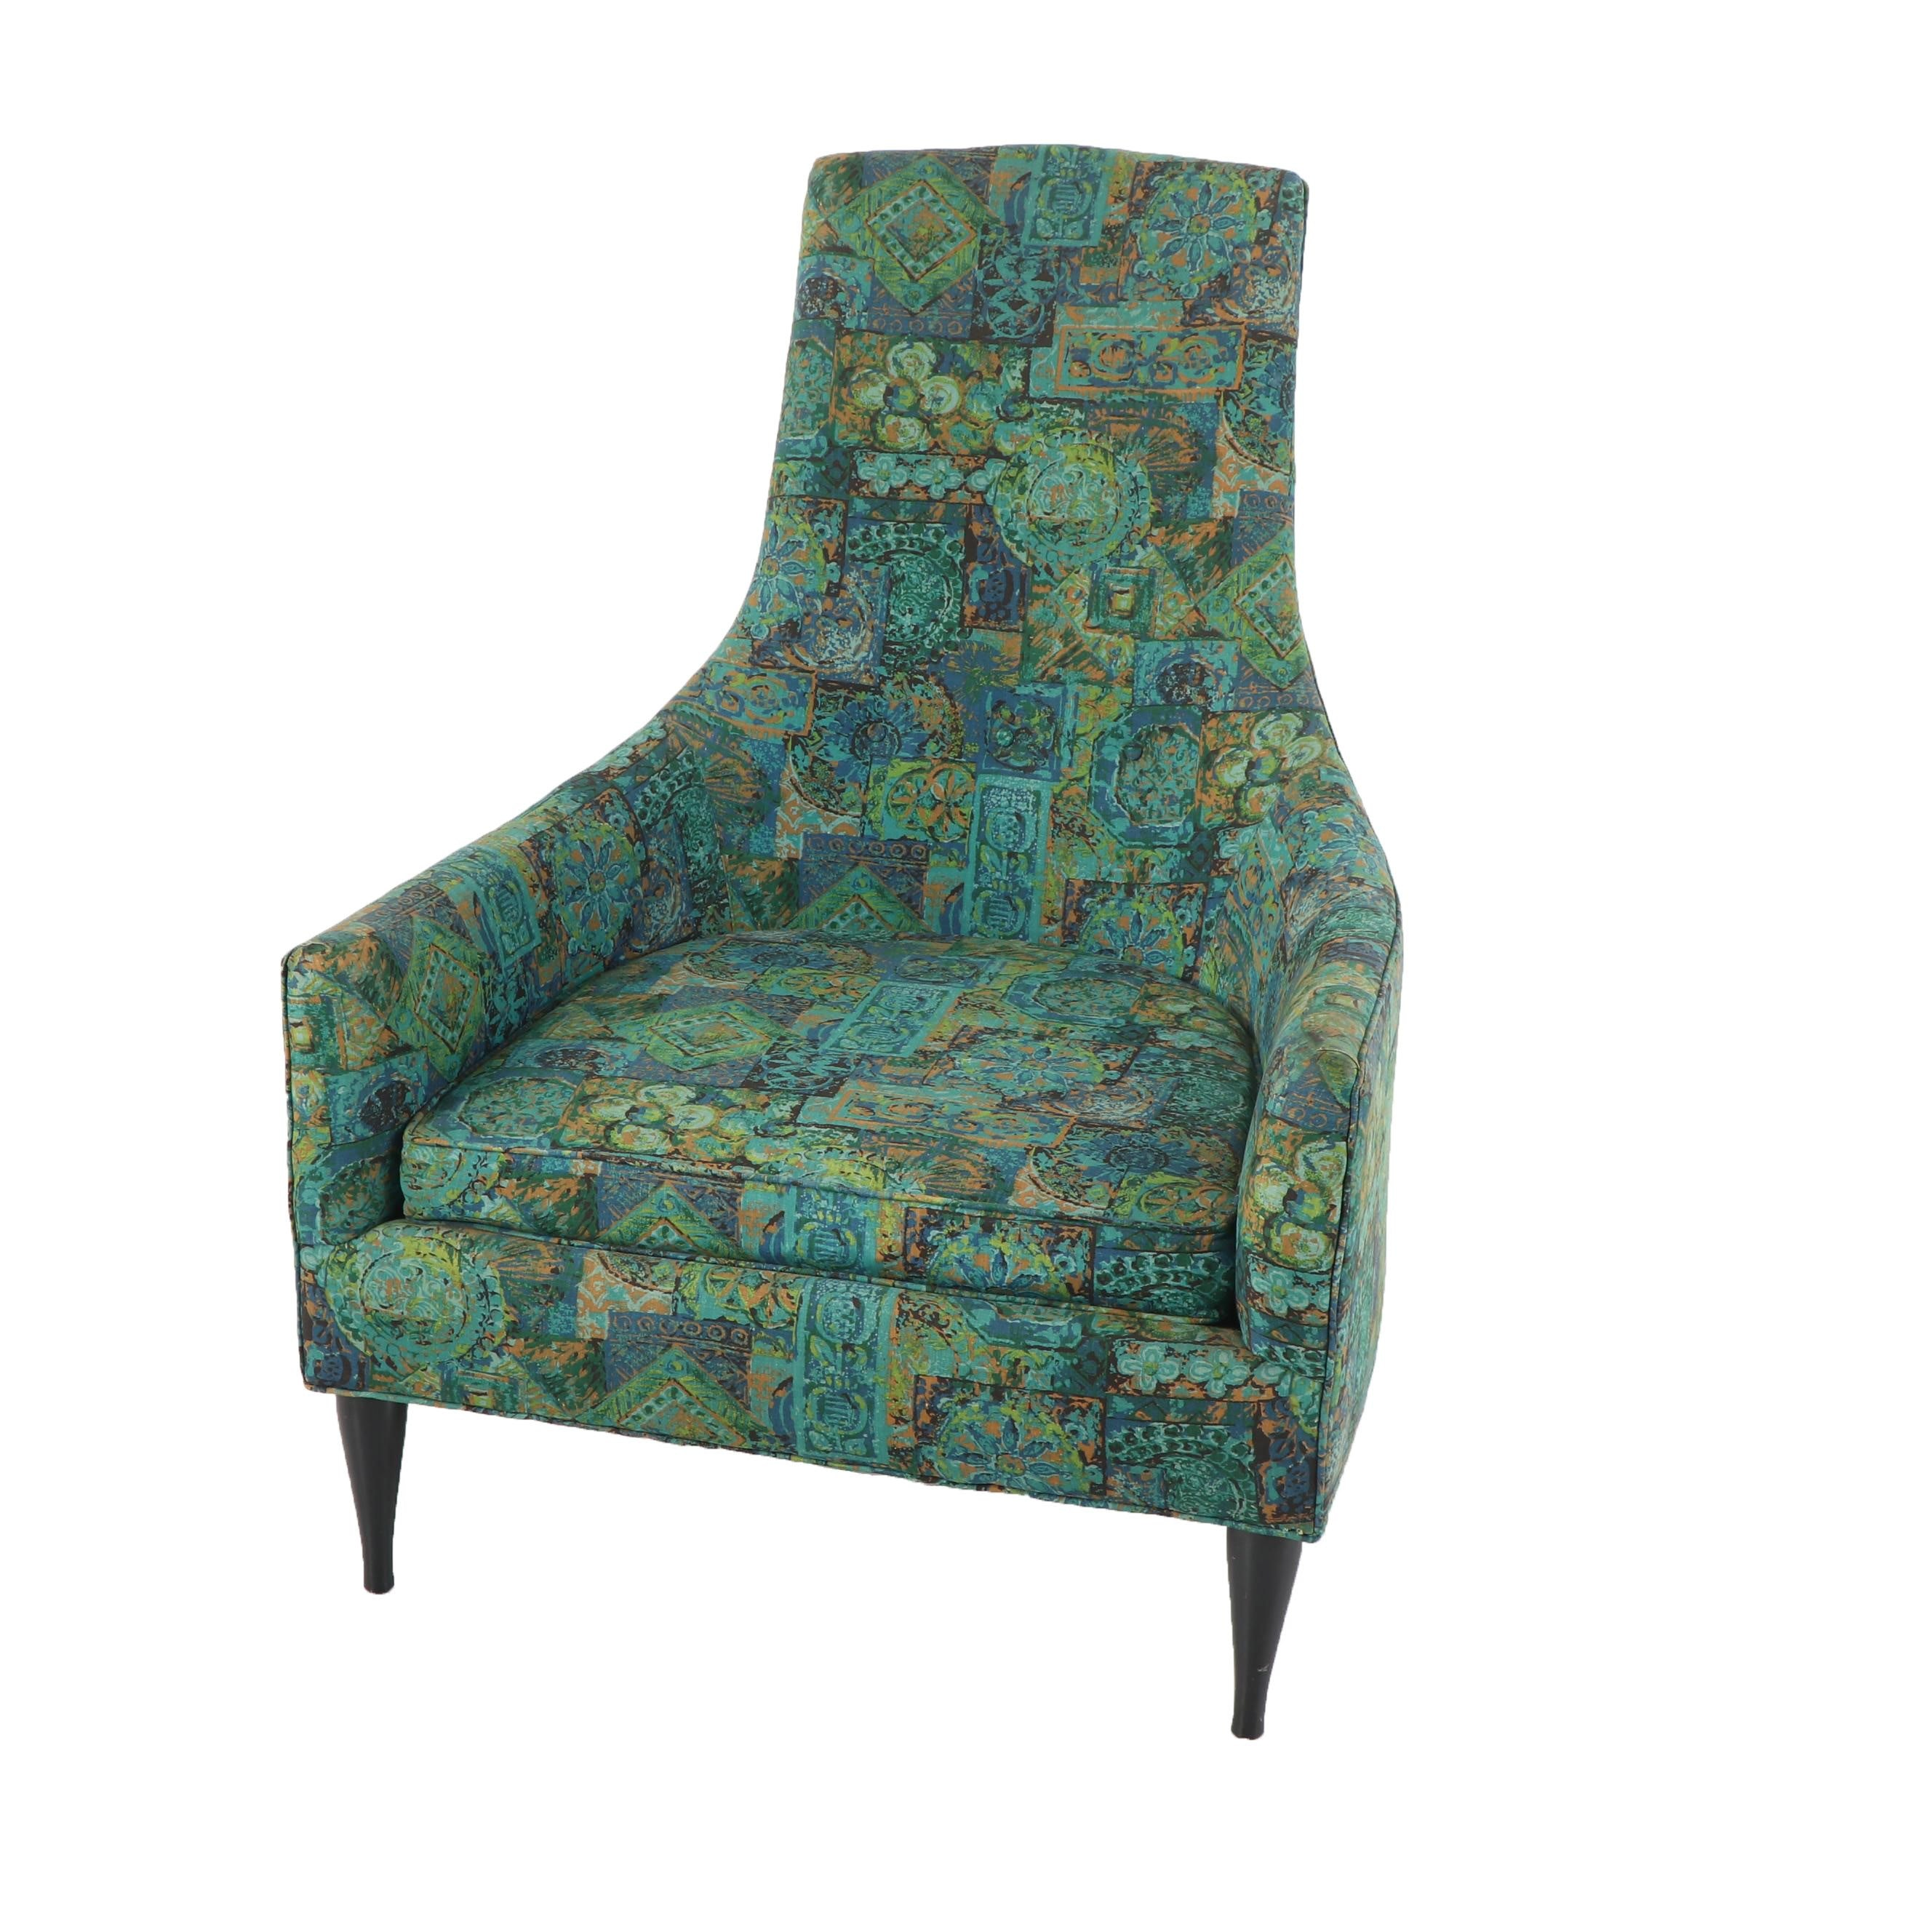 Mid Century Modern Upholstered Armchair, Mid 20th Century